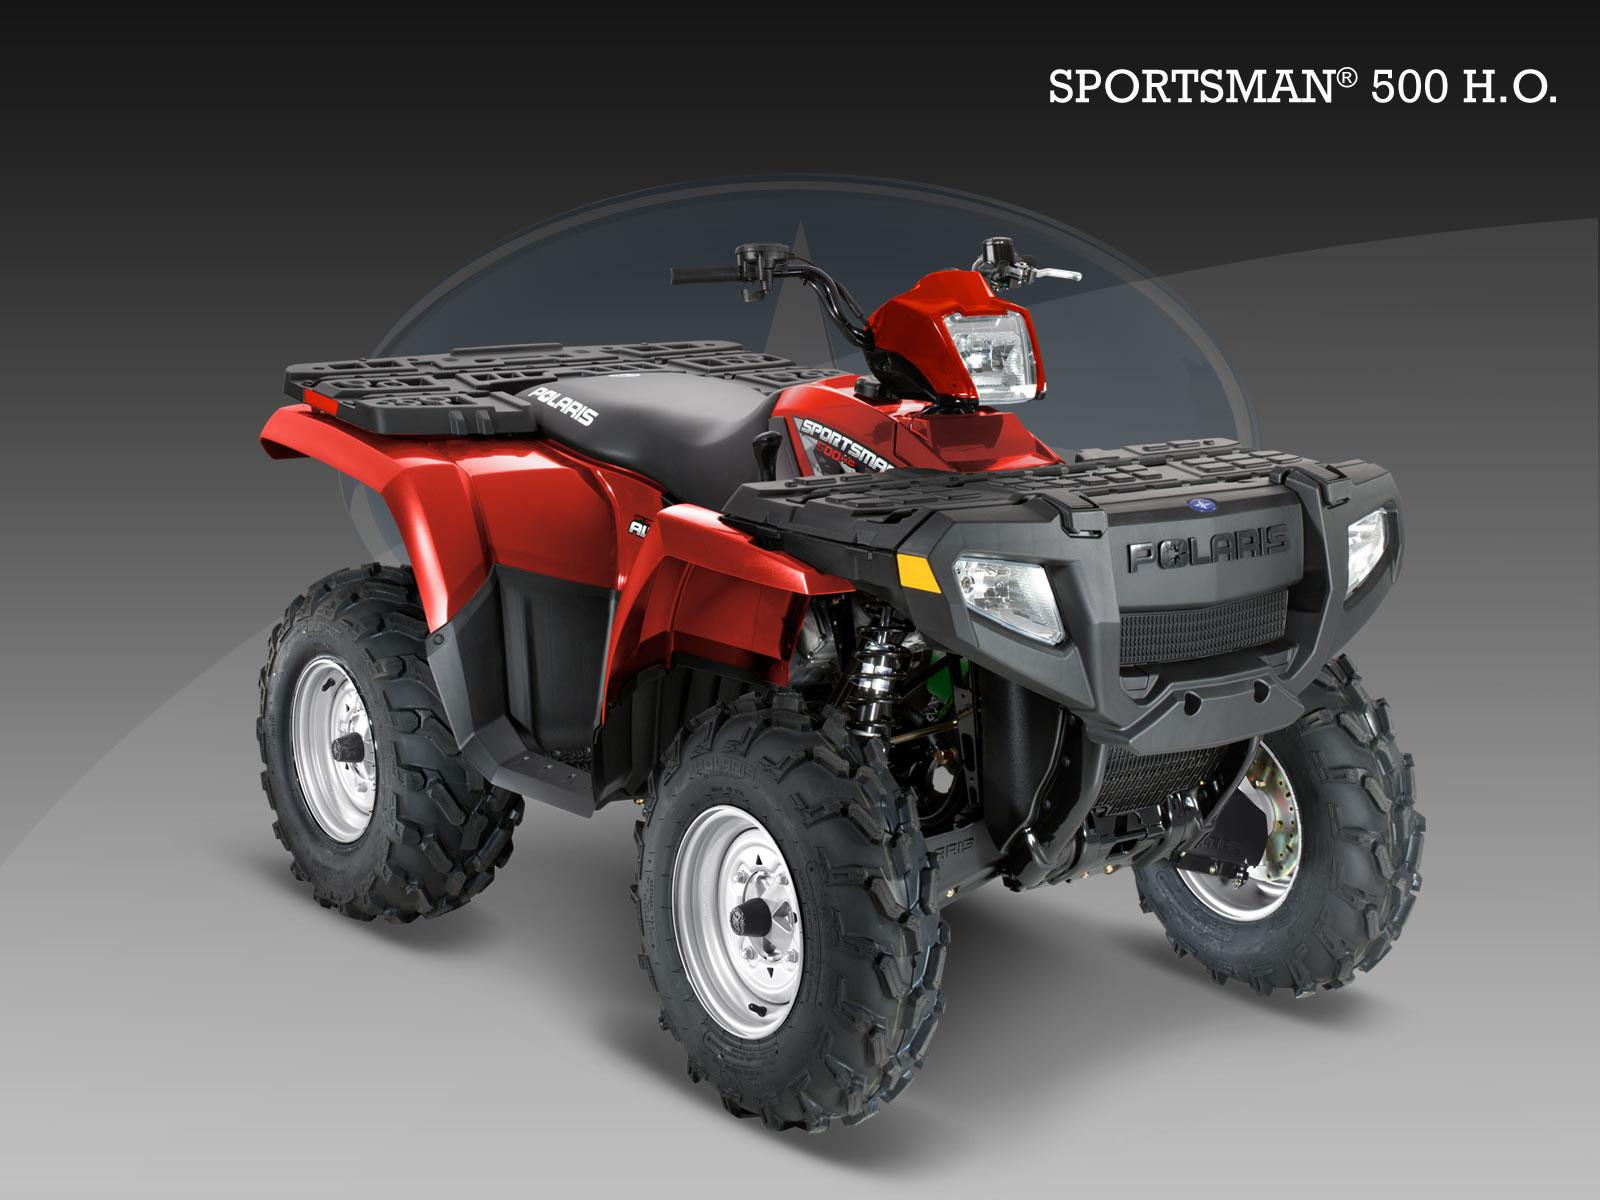 Polaris Slingshot Automatic >> POLARIS Sportsman 500 H.O. specs - 2009, 2010 - autoevolution